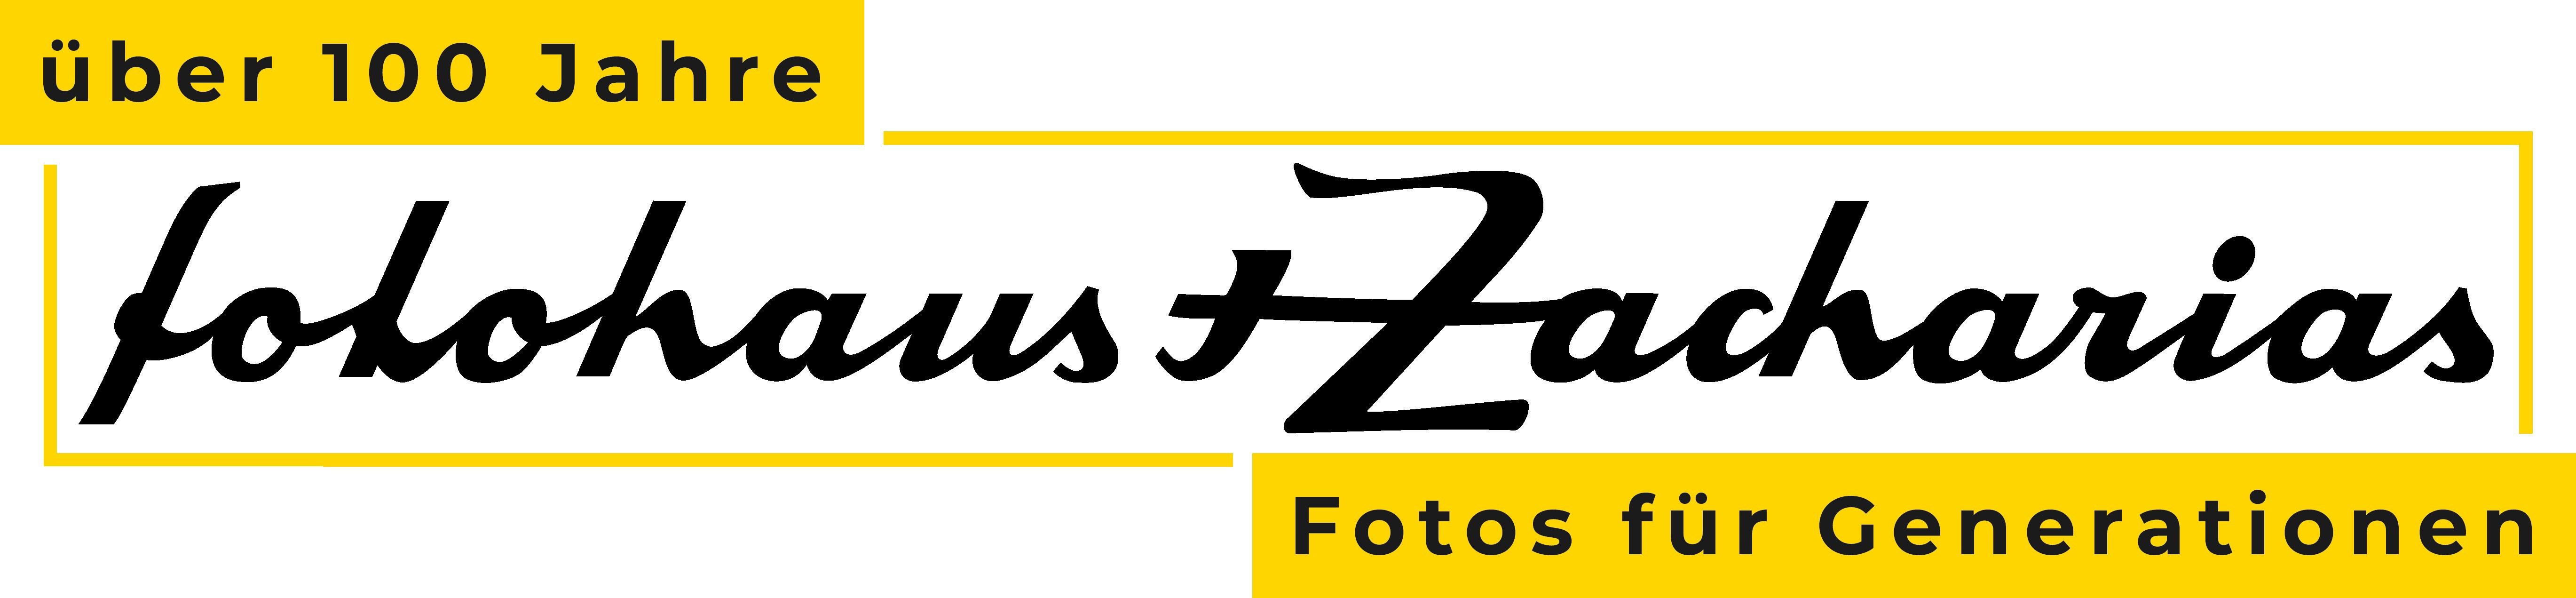 Fotohaus Zacharias